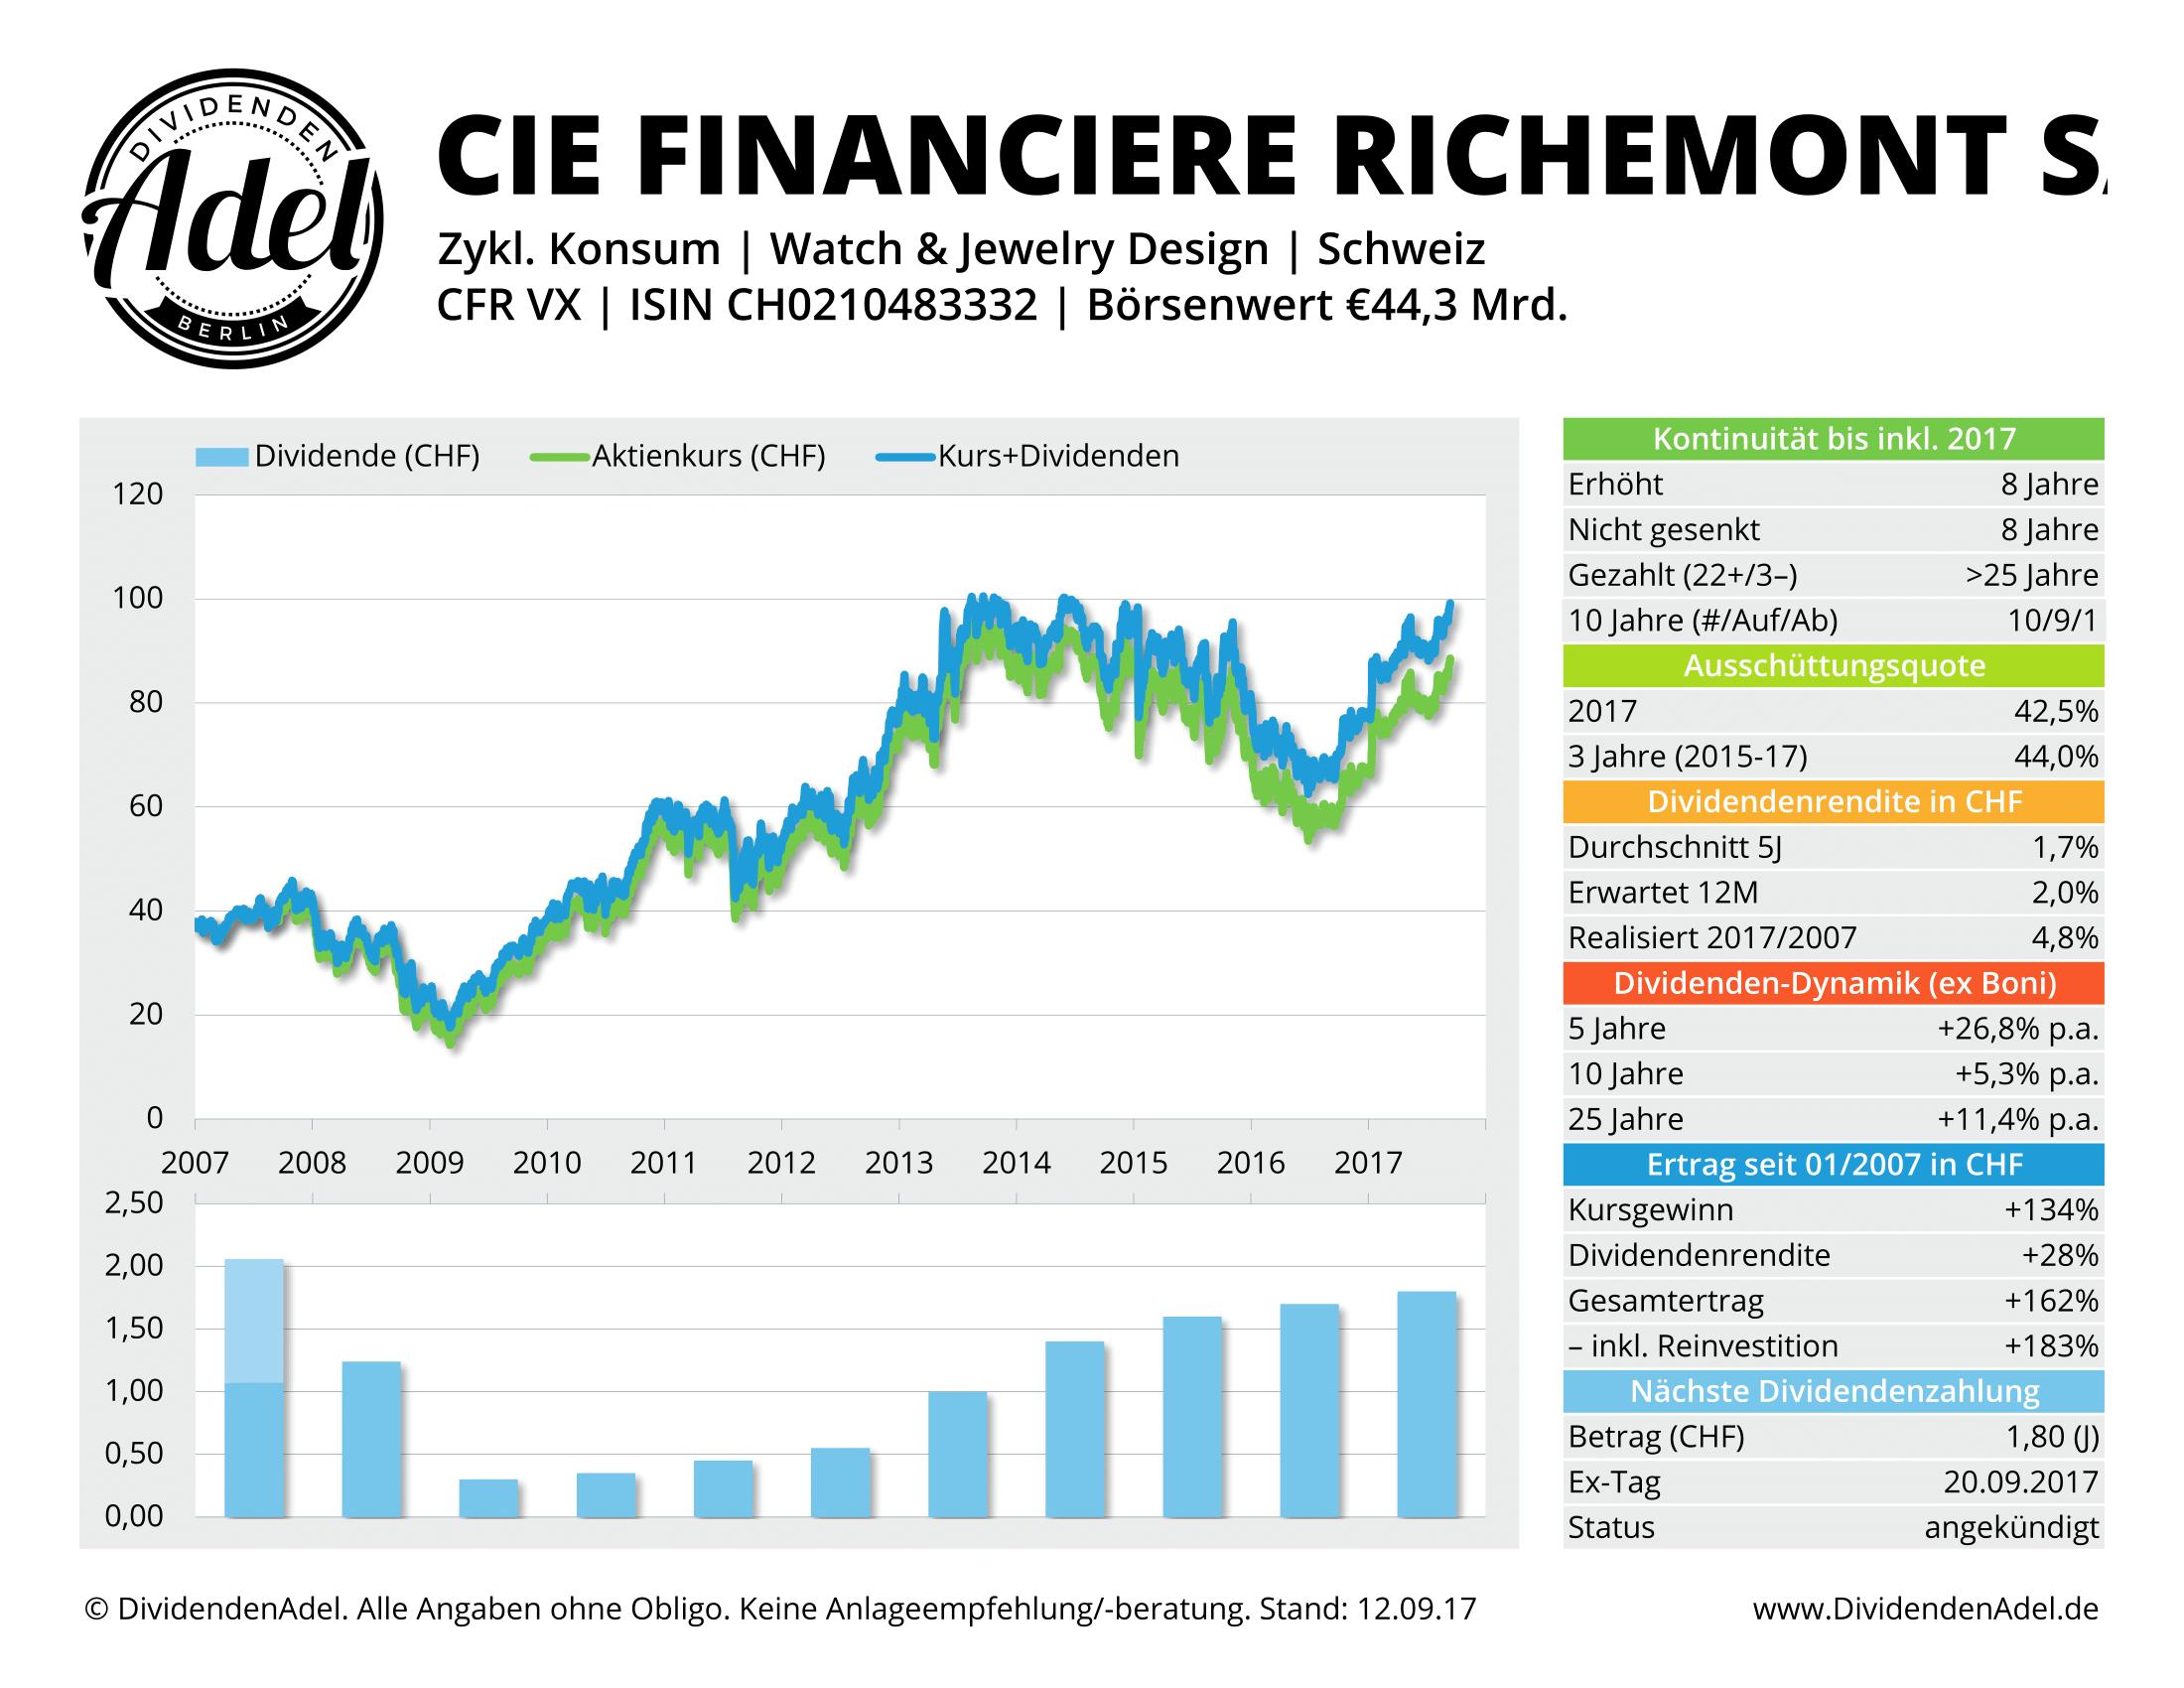 2017-09-12 58 CIE FINANCI-REG DividendenAdel-Profil ab 2007-1